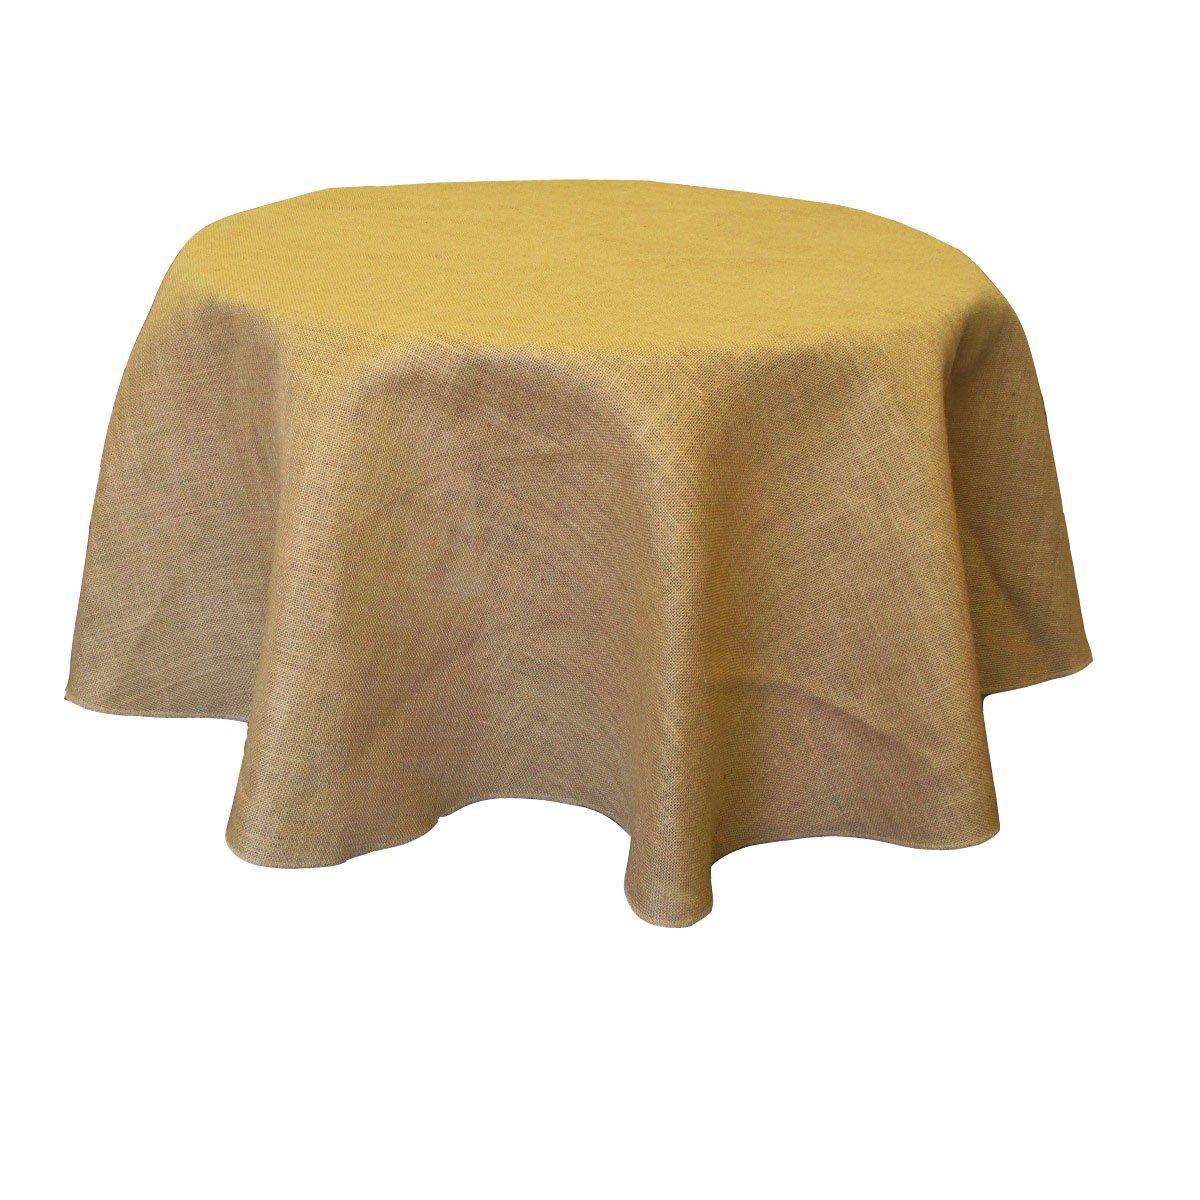 Burlap Round Table Overlays Amazoncom La Linen 58 Inch Round Jute Burlap Table Overlay